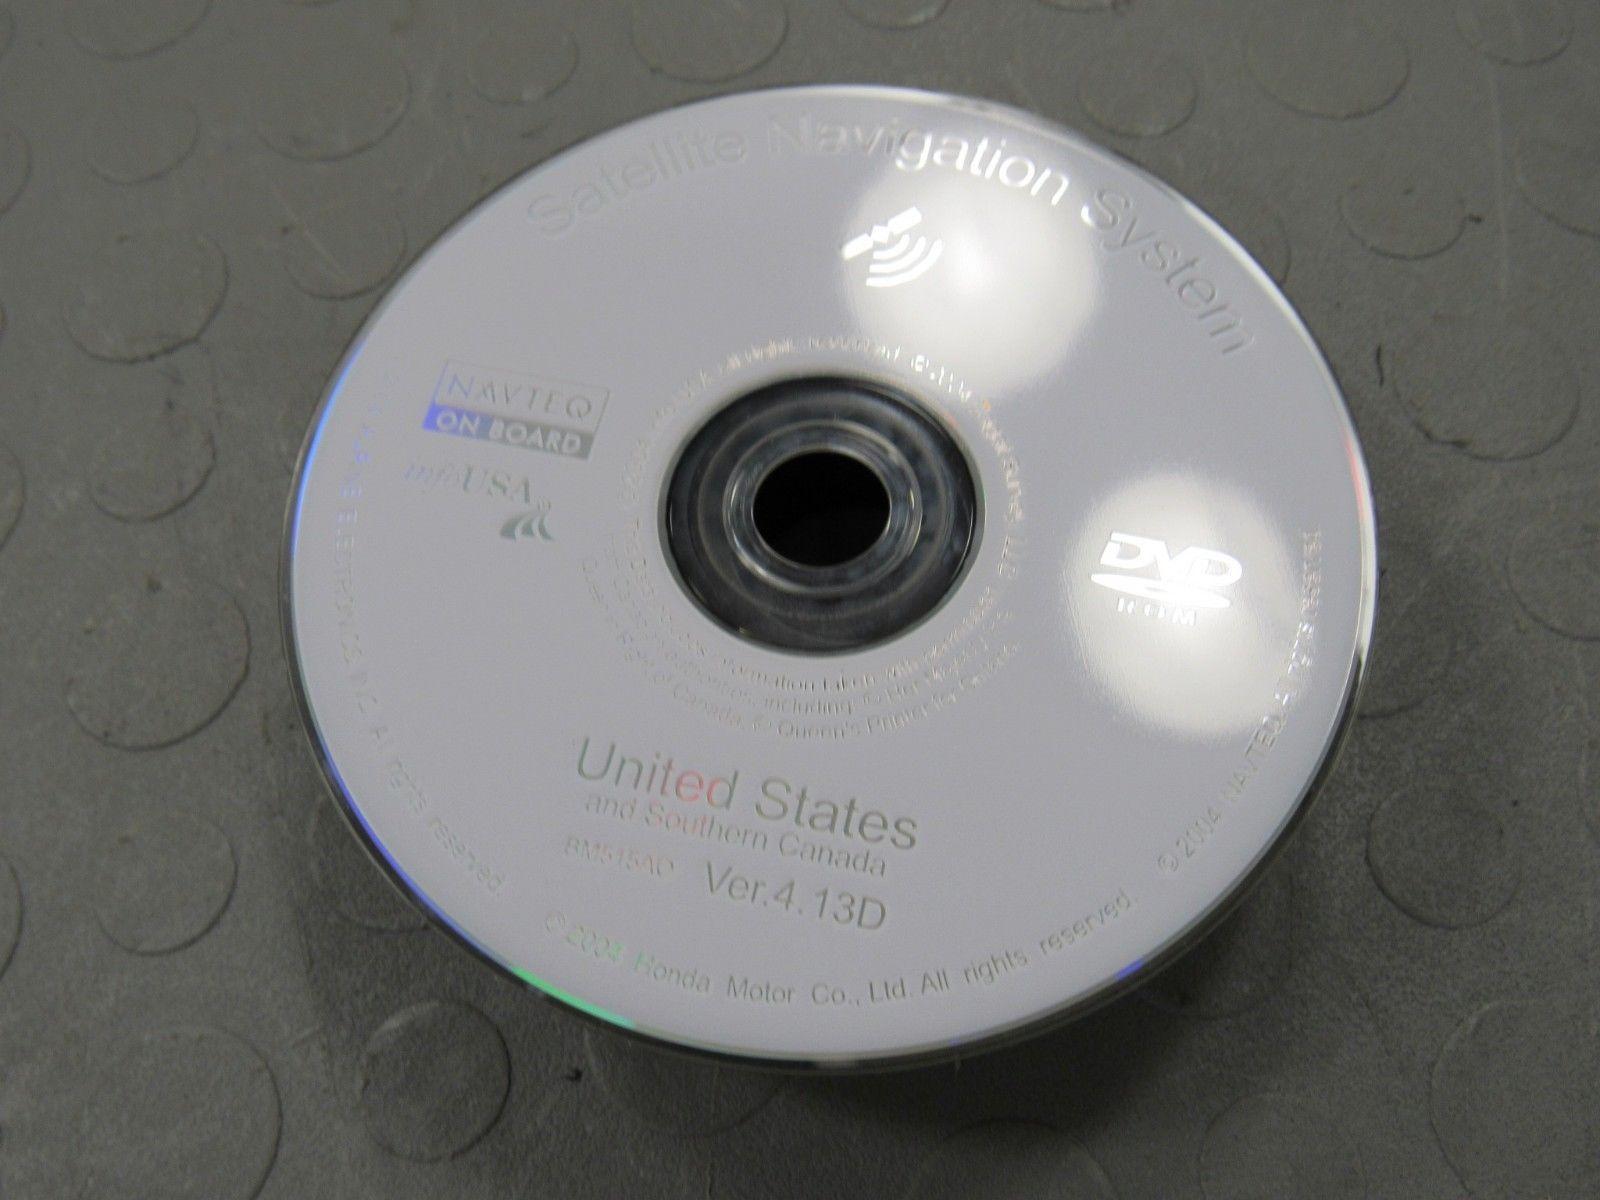 05-07 Honda Odyssey GPS Navigation Navi DVD ROM Disc Drive  39540-SHJ-A010-M1 U